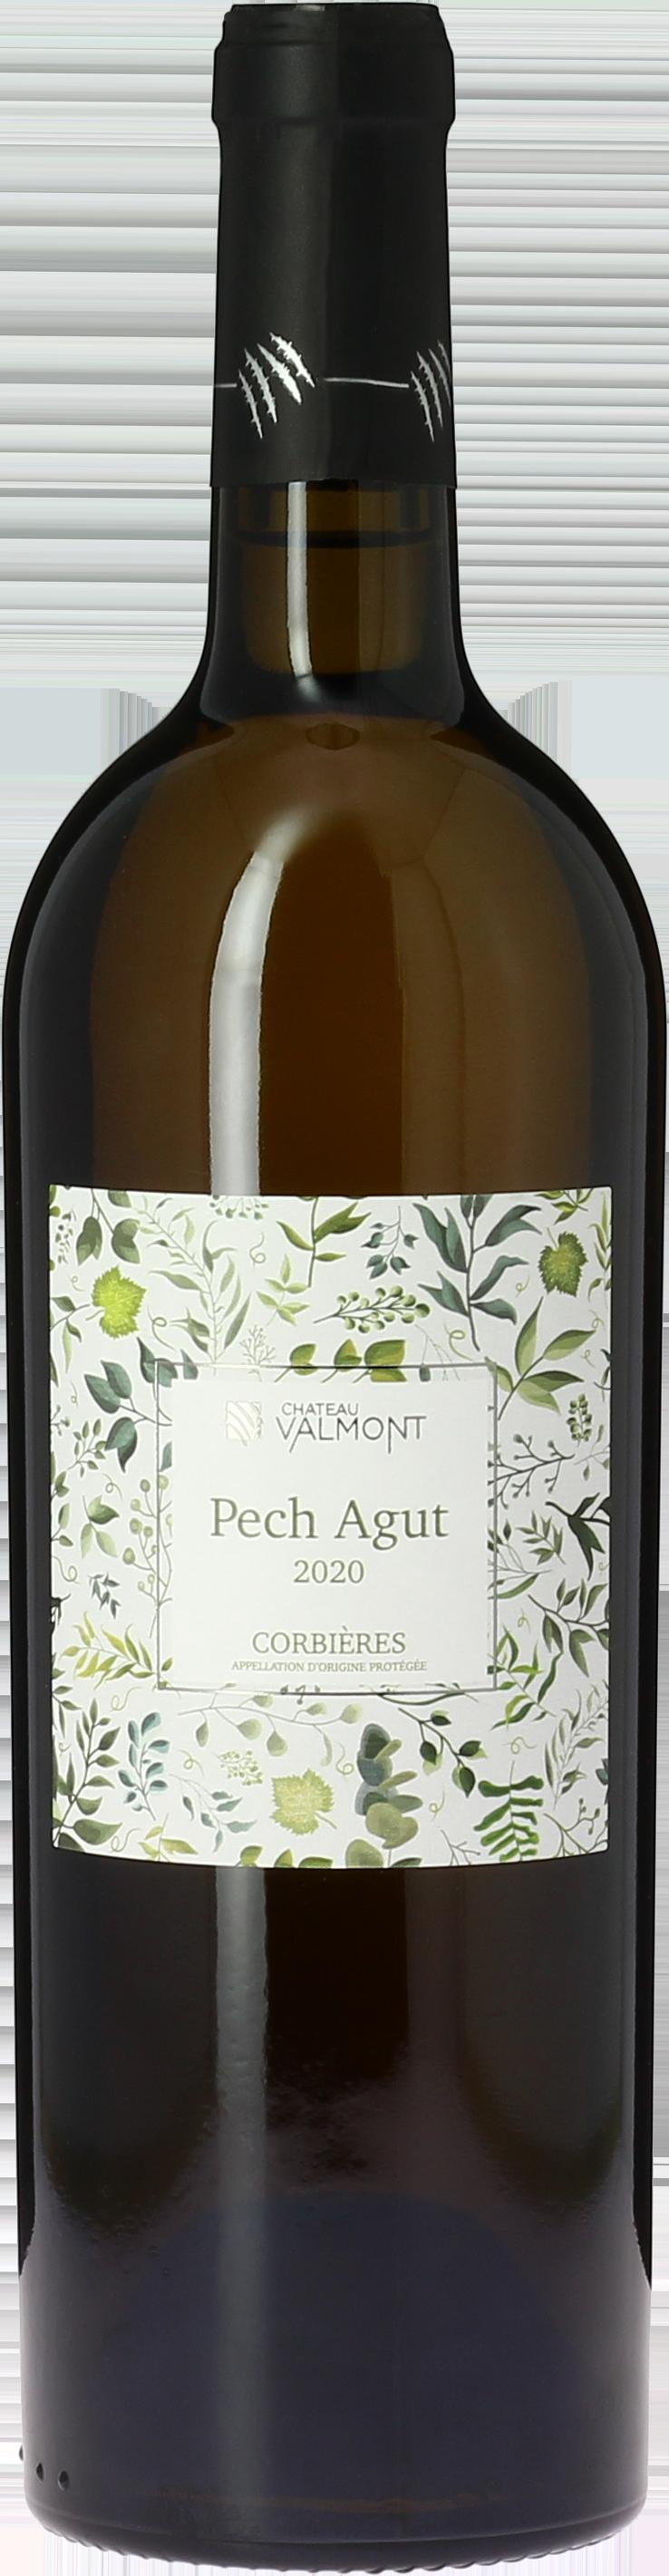 Pech Agut – Château Valmont